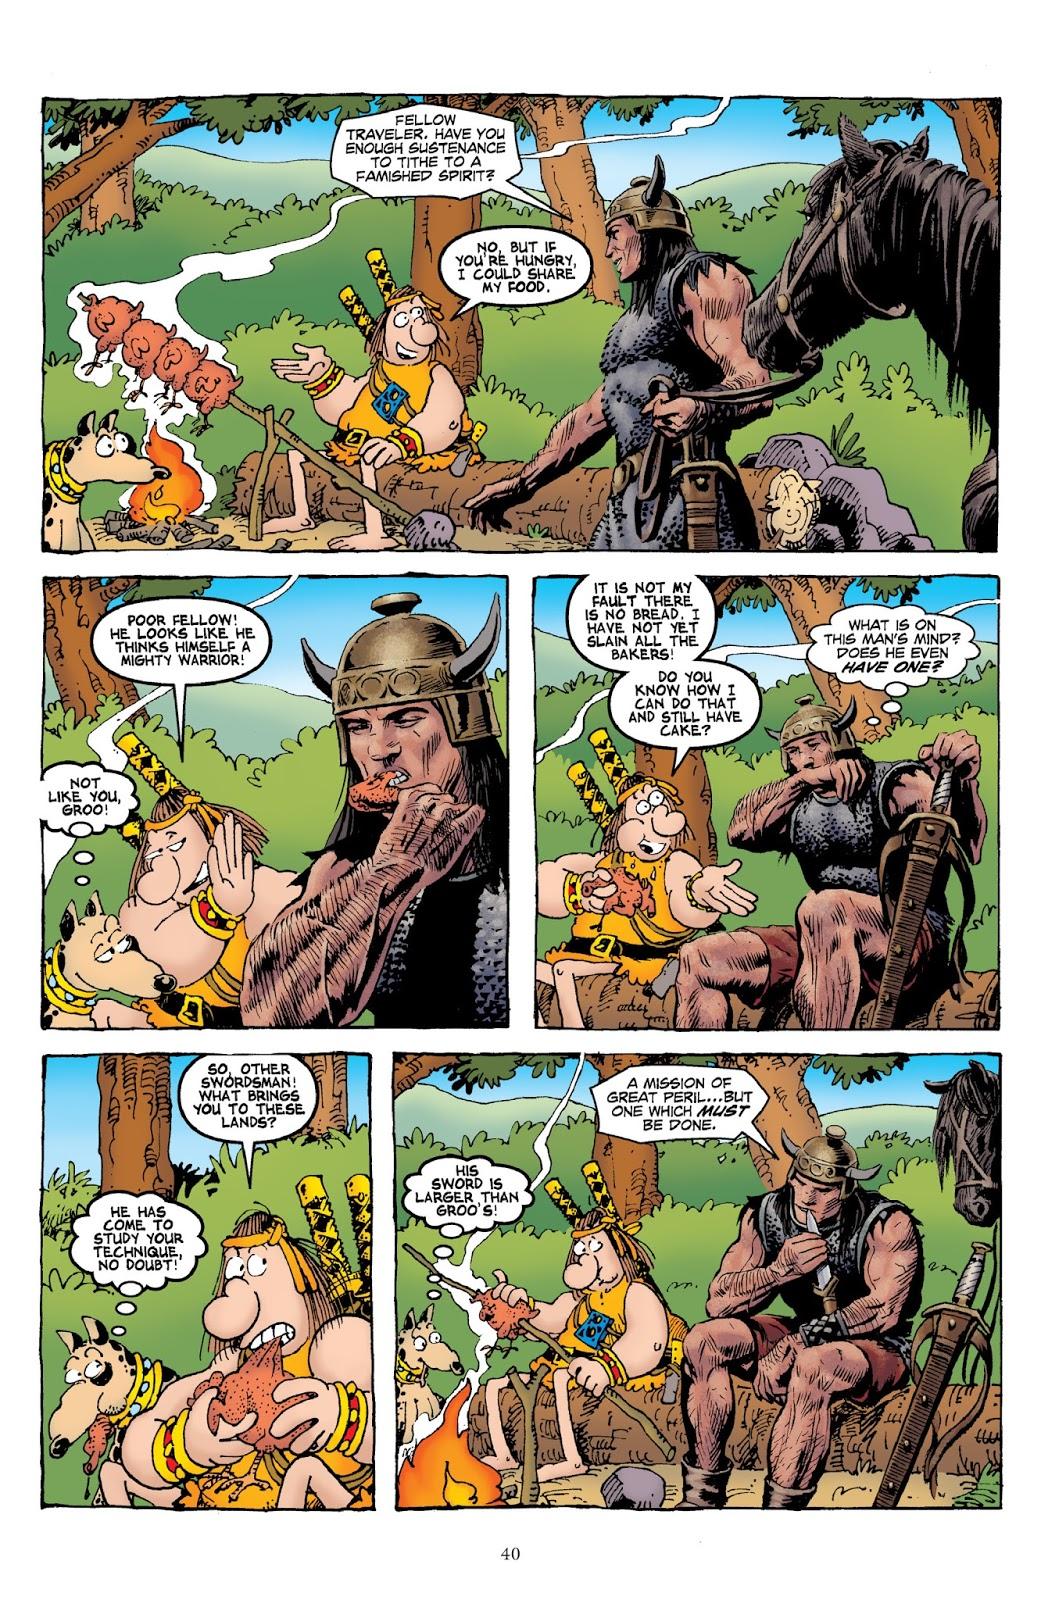 Groo vs Conan review